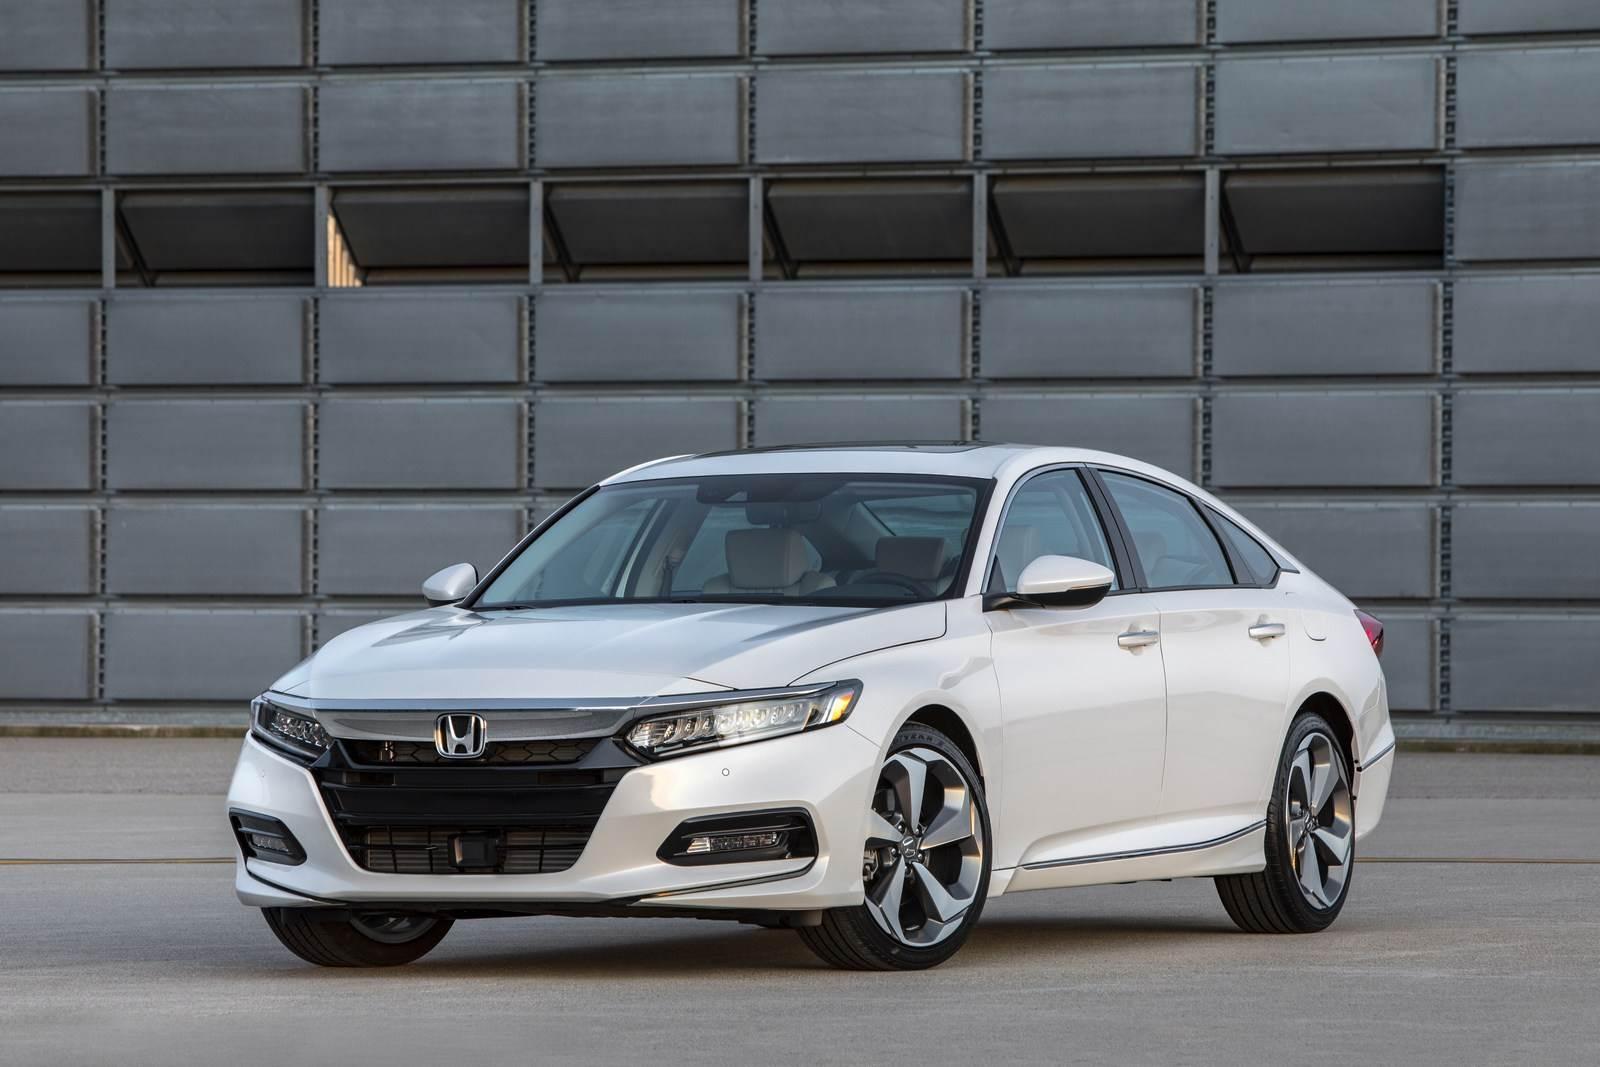 2018 Honda Accord image gallery